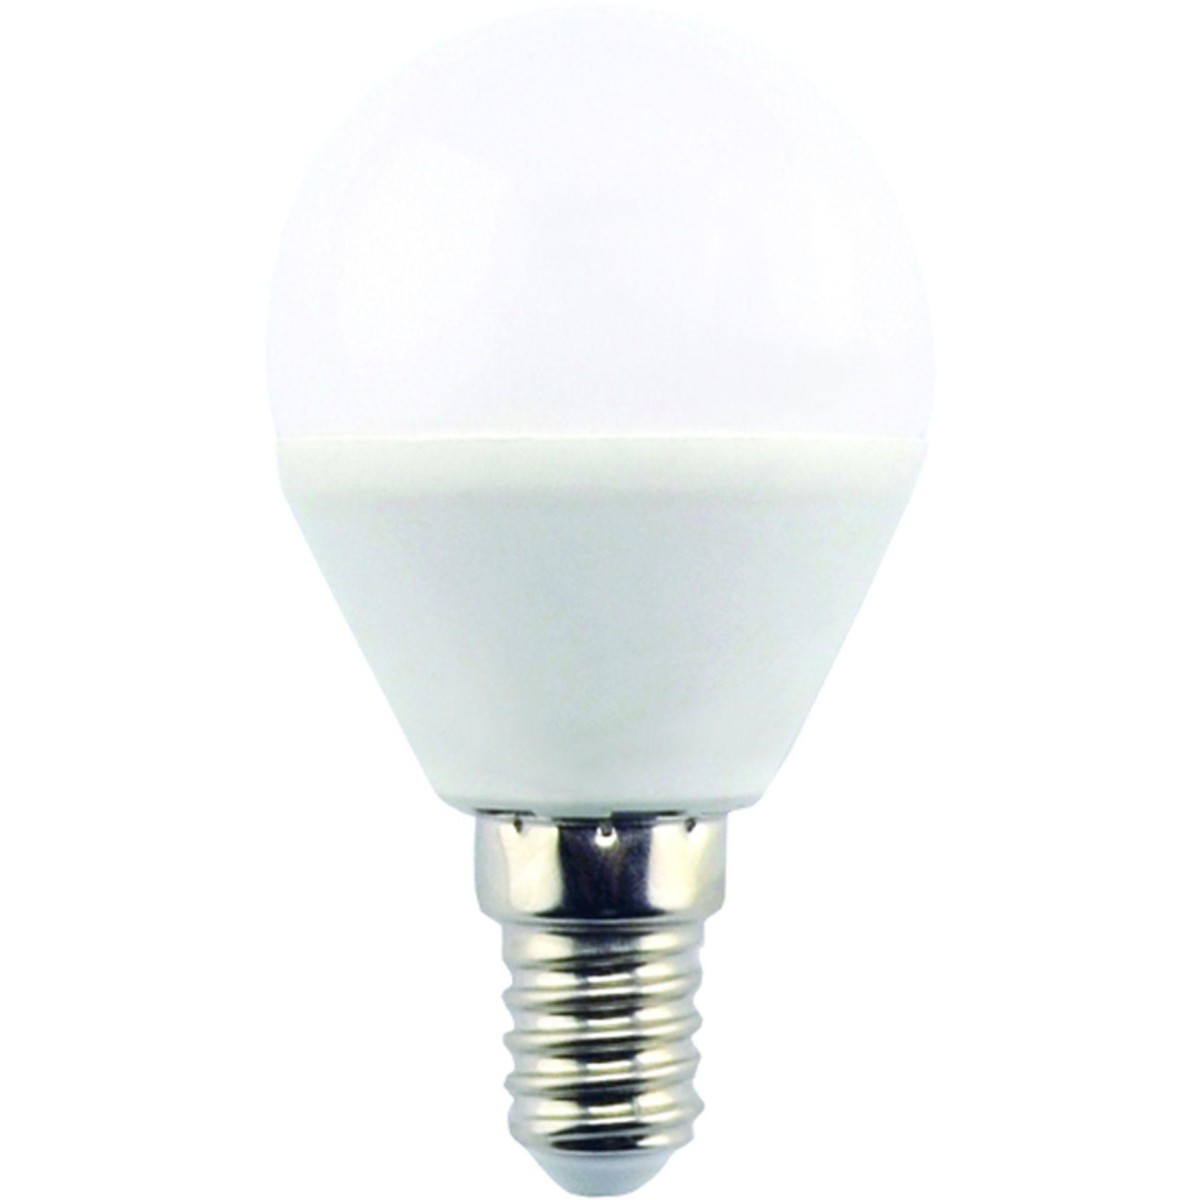 Лампа Ecola light E14 7 Вт шар 560 Лм теплый 4 шт